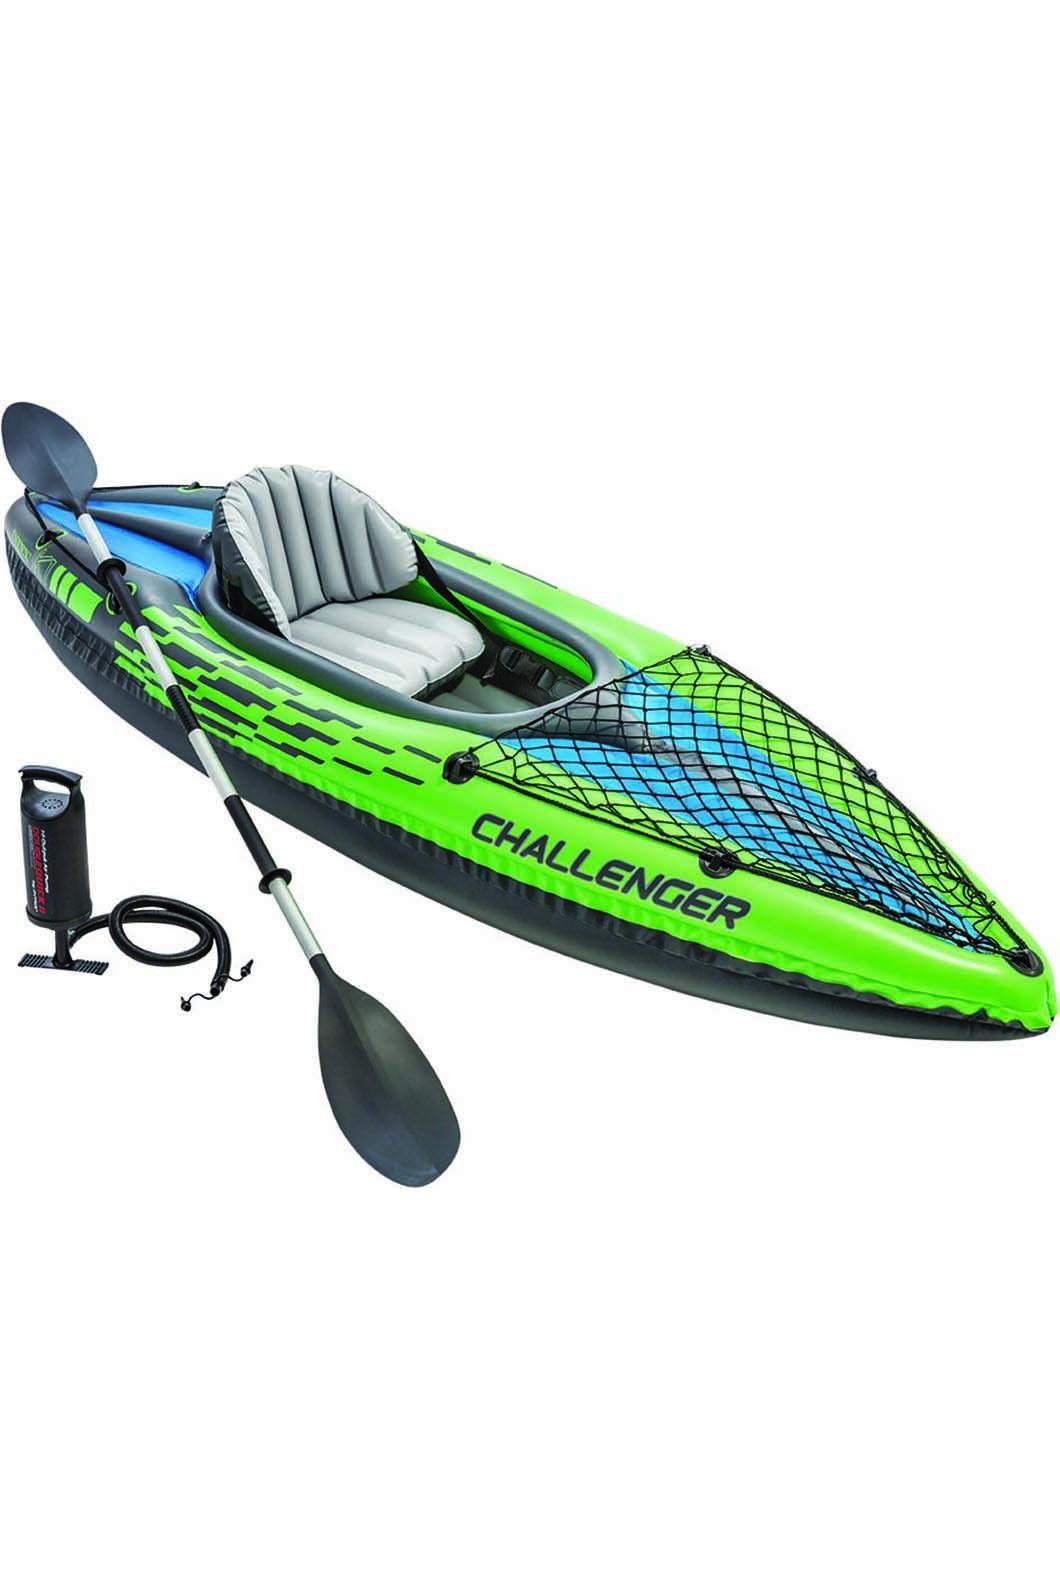 Intex Challenger Inflatable Kayak, None, hi-res